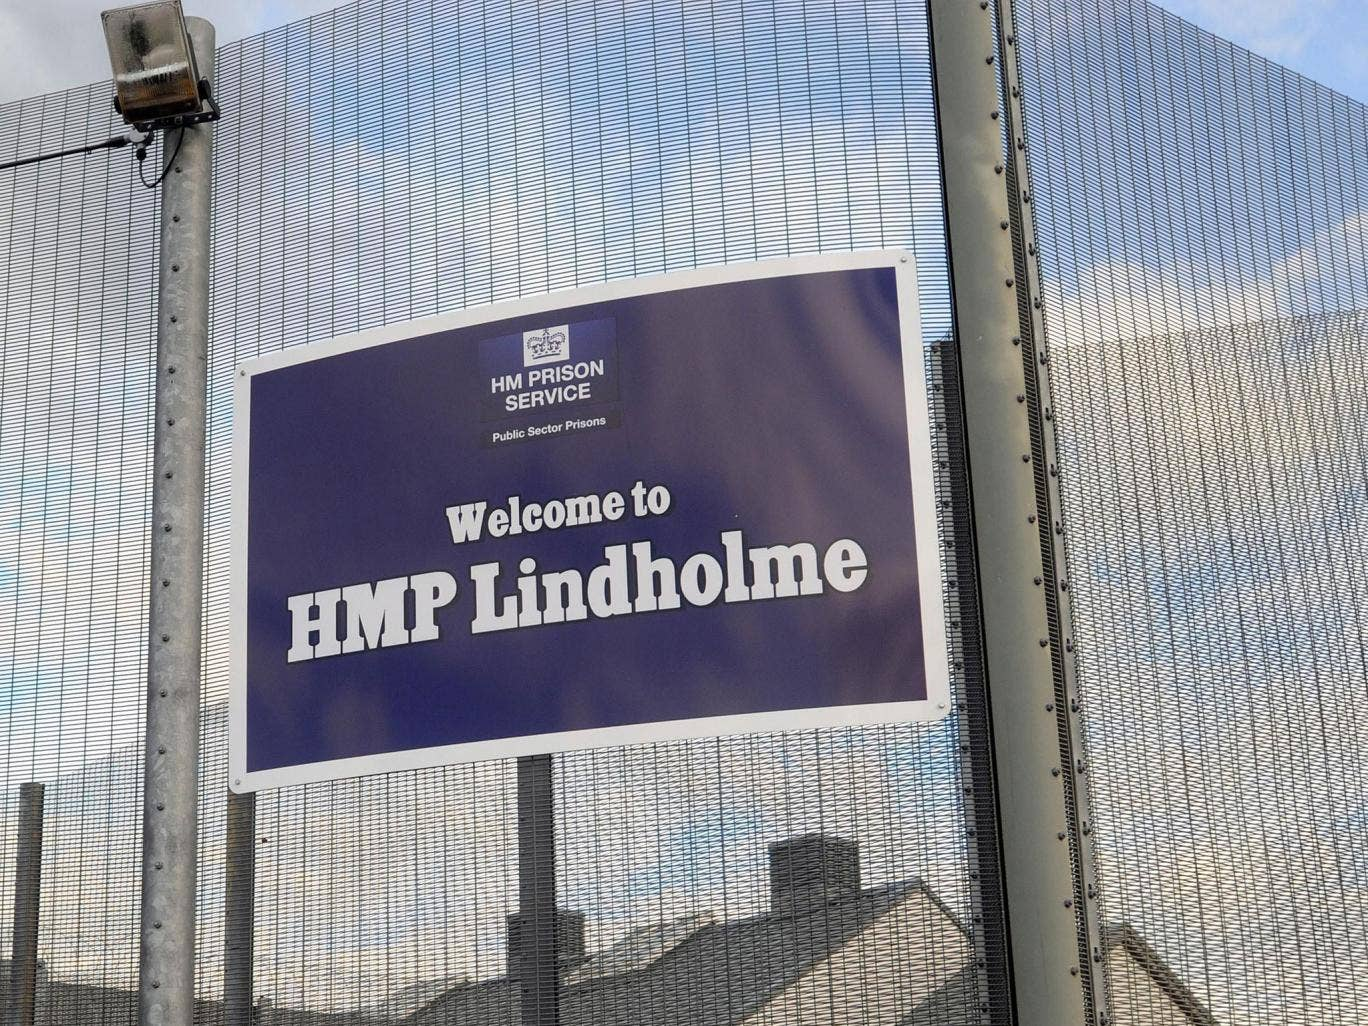 Two inmates have been arrested on suspicion of murder after a prisoner was found dead at HMP Lindholme